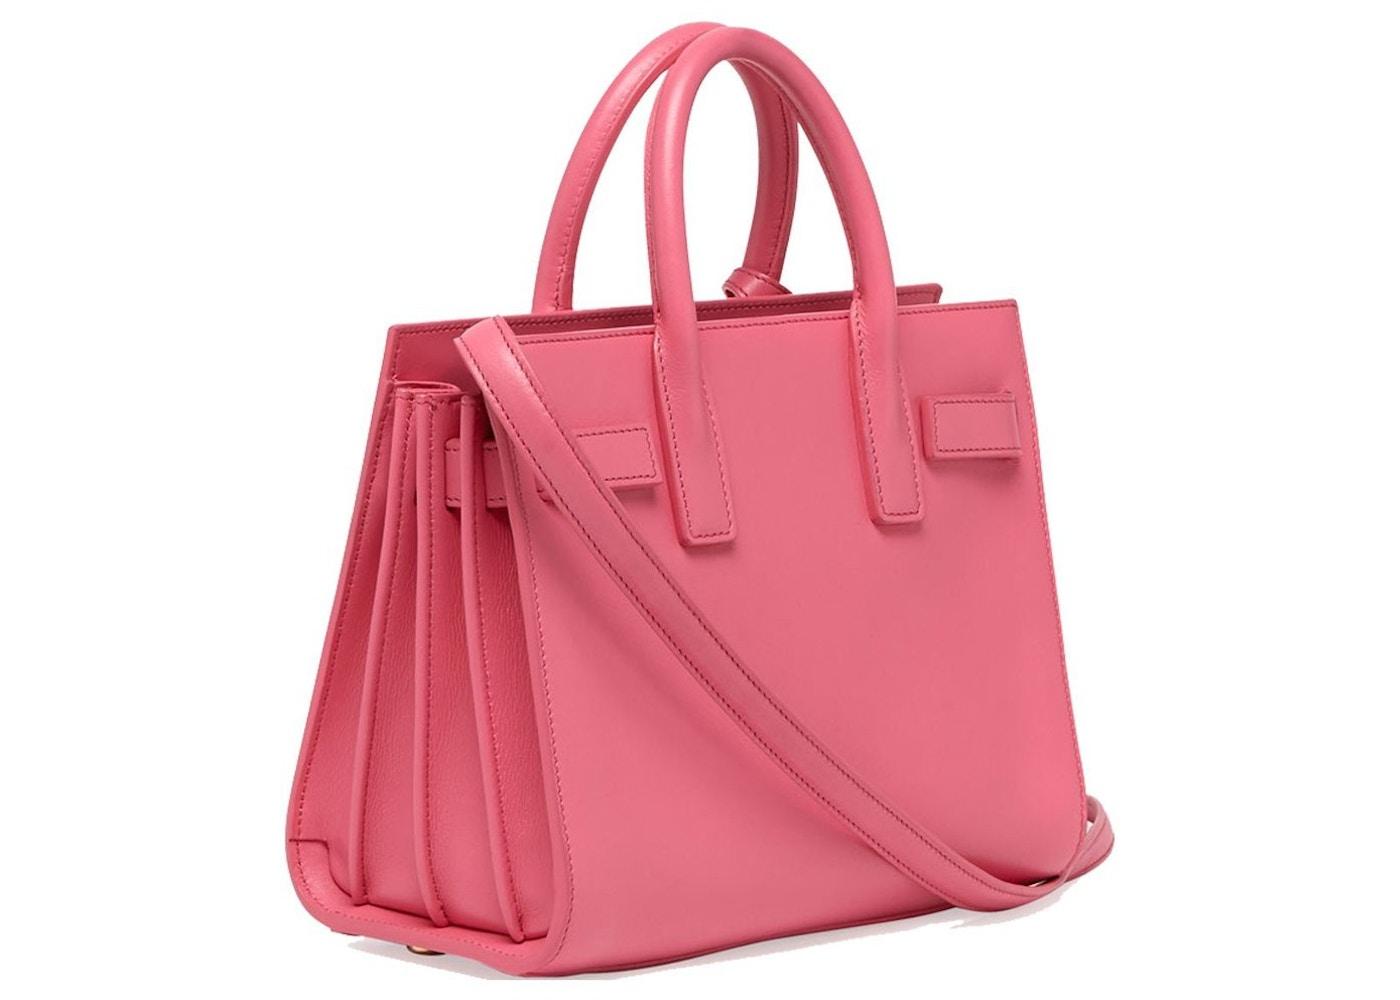 1efc1b74c595 Buy   Sell Saint Laurent Sac de Jour Handbags